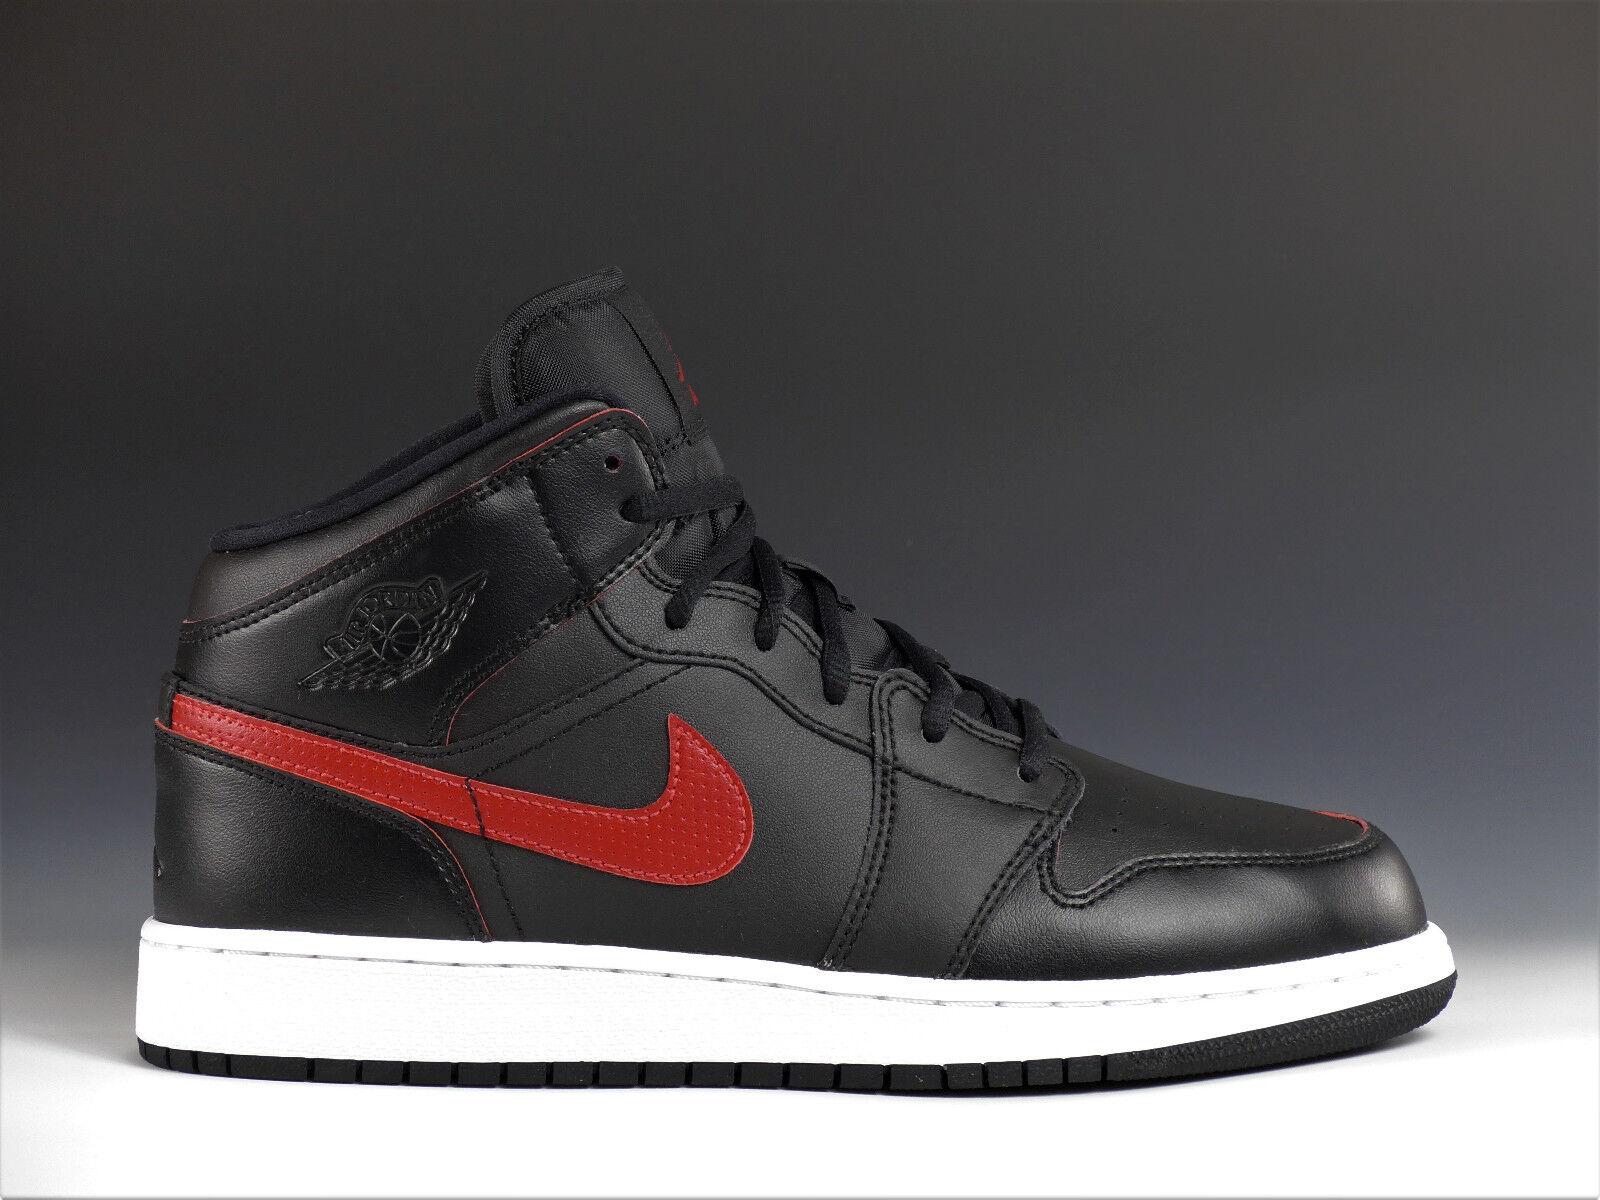 Nike Air Jordan 1 Mi BG Baskets Femme 554725 Enfants Chaussures de sport 554725 Femme 009 660ecb